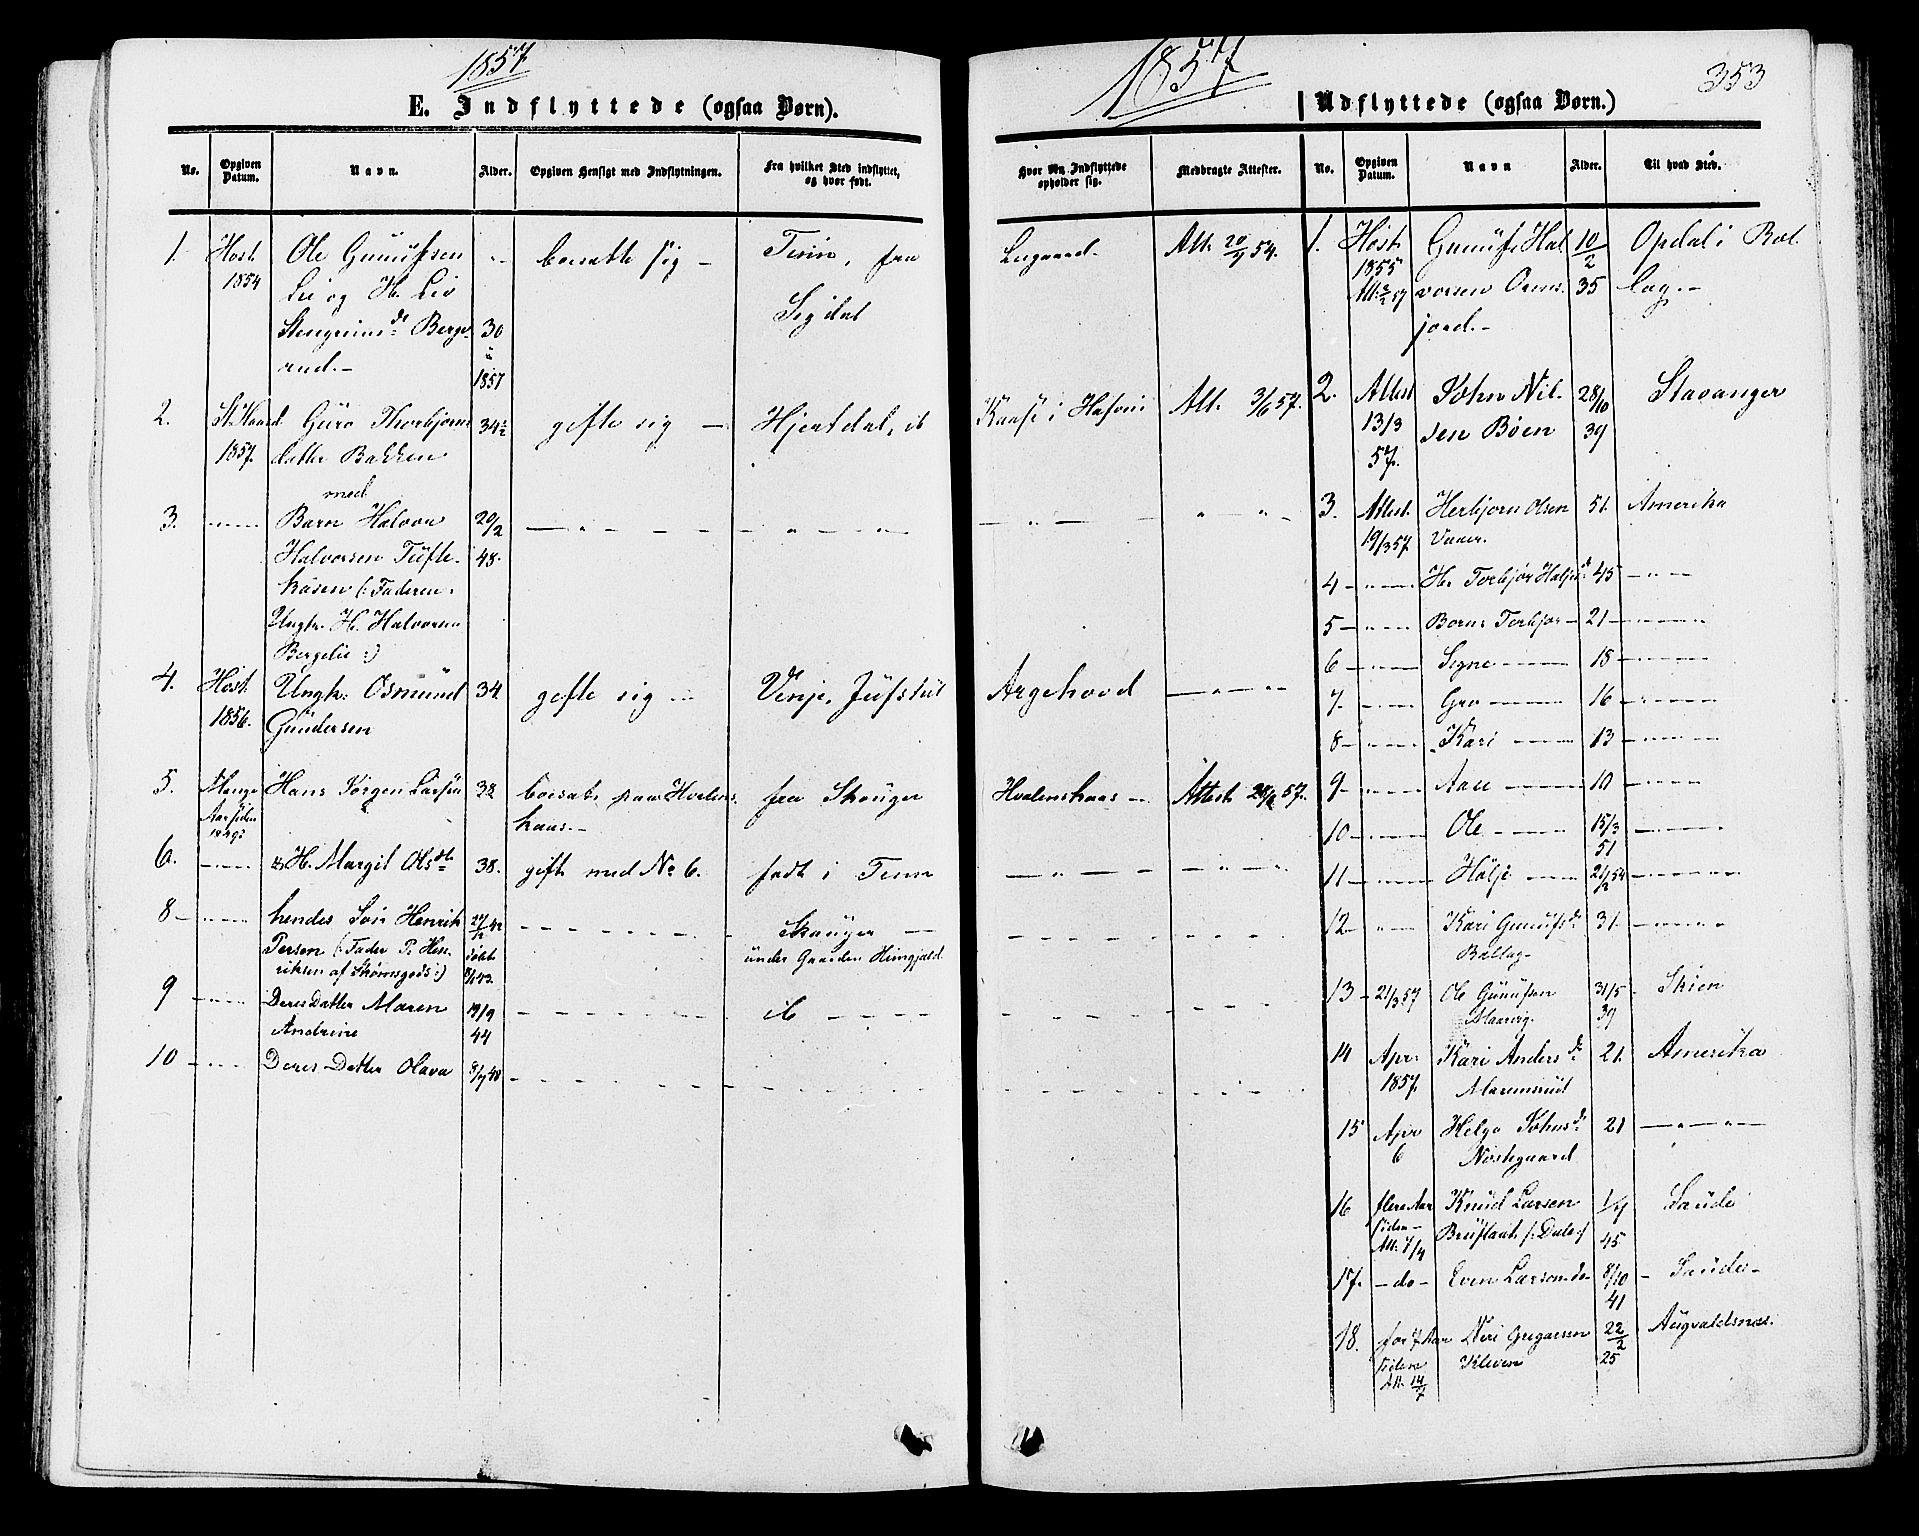 SAKO, Tinn kirkebøker, F/Fa/L0006: Ministerialbok nr. I 6, 1857-1878, s. 353